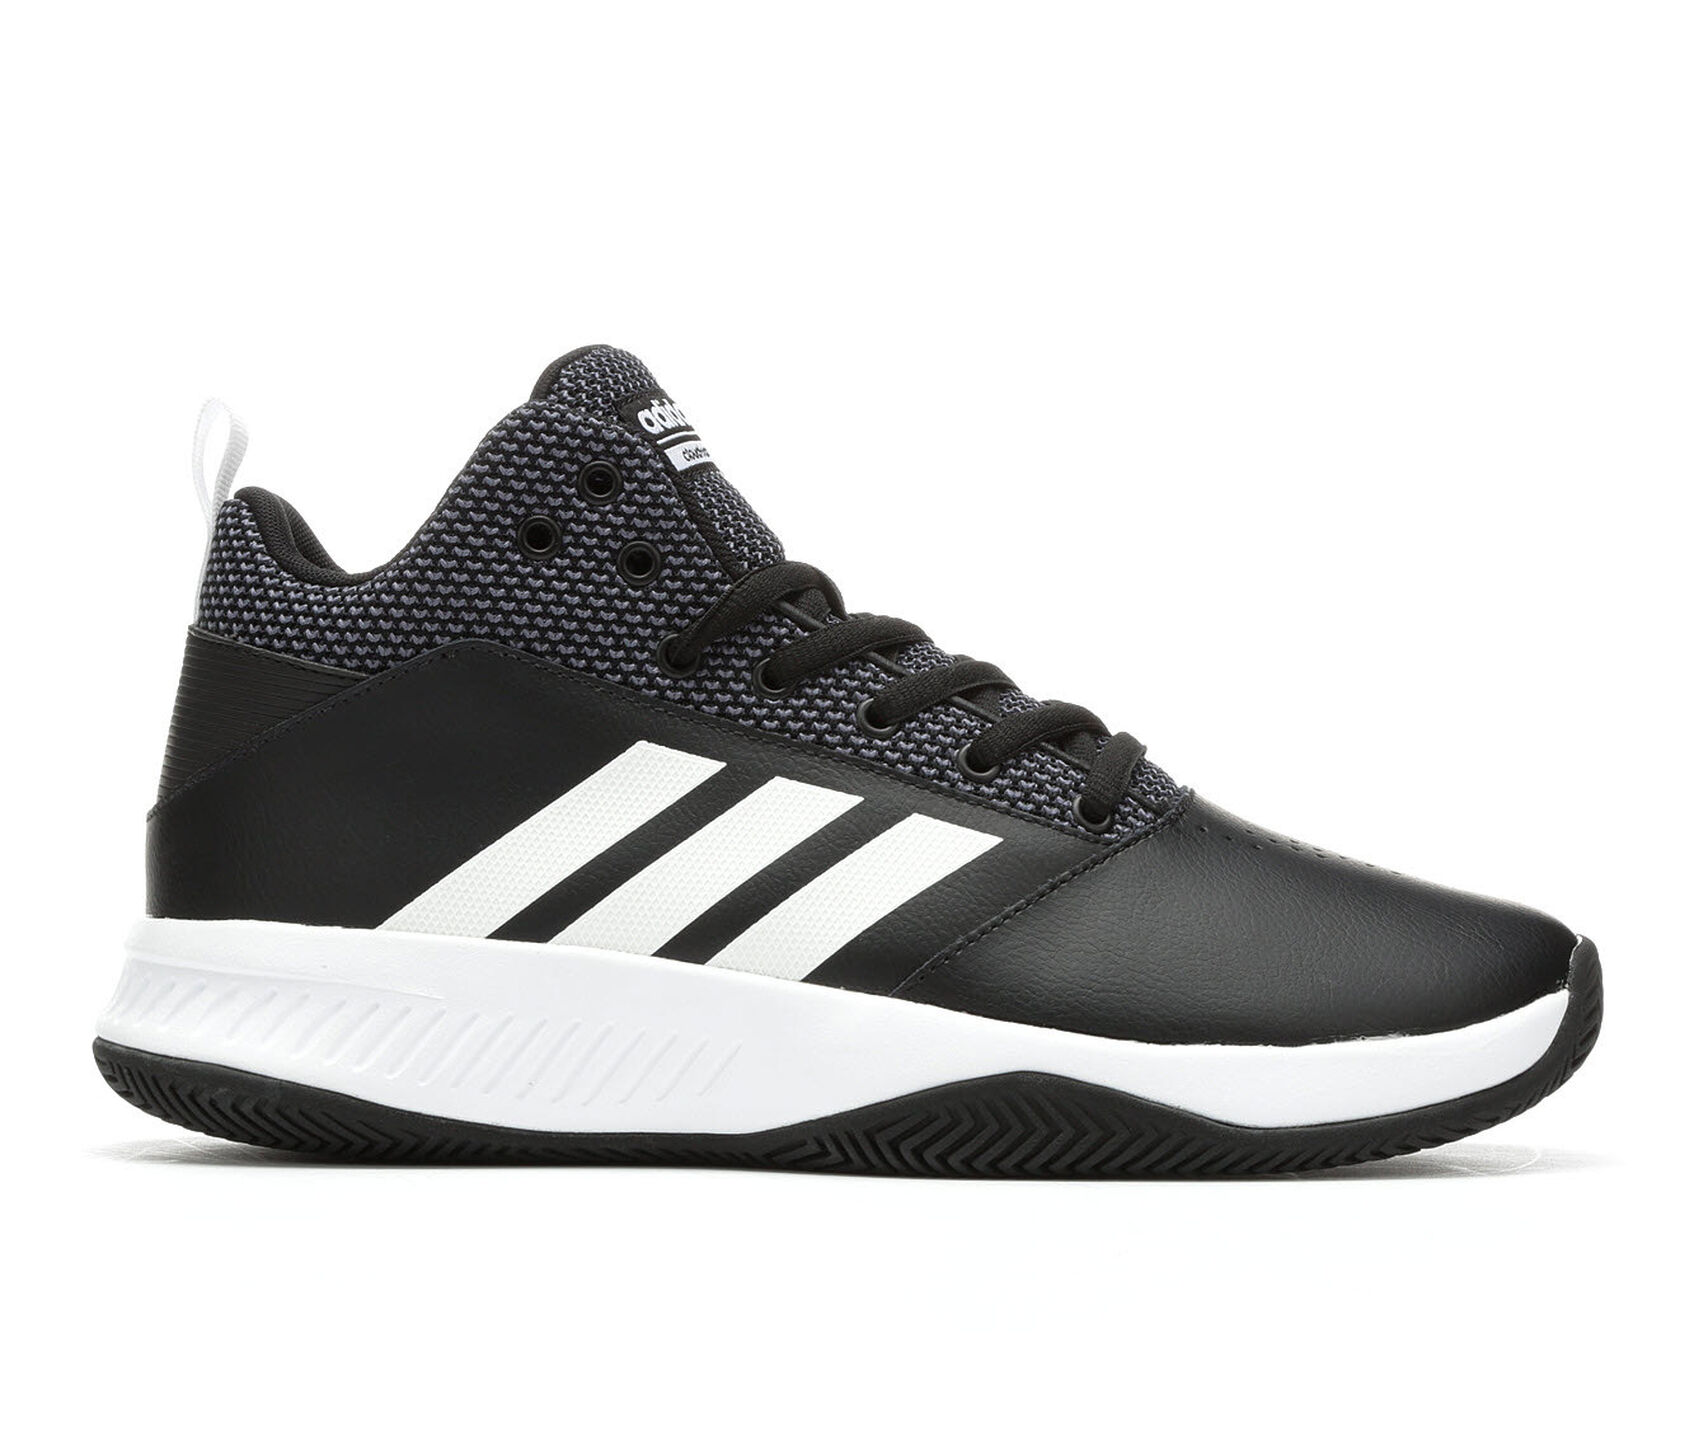 0d1ae2fe2 Adidas Cloudfoam Ilation 2.0 High Top Basketball Shoes.